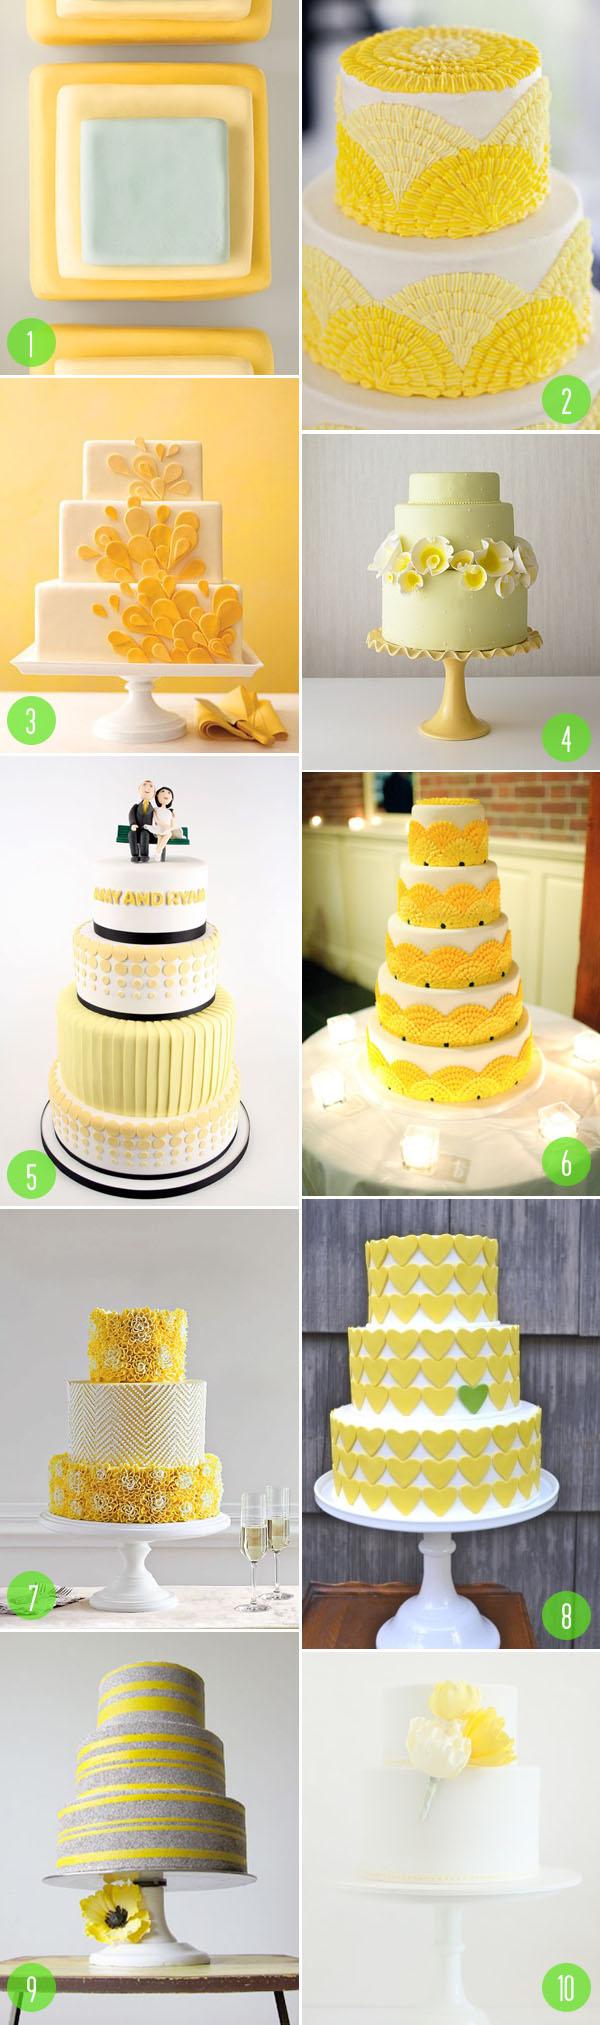 Top 10: Yellow wedding cakes - Brooklyn Bride - Modern Wedding Blog